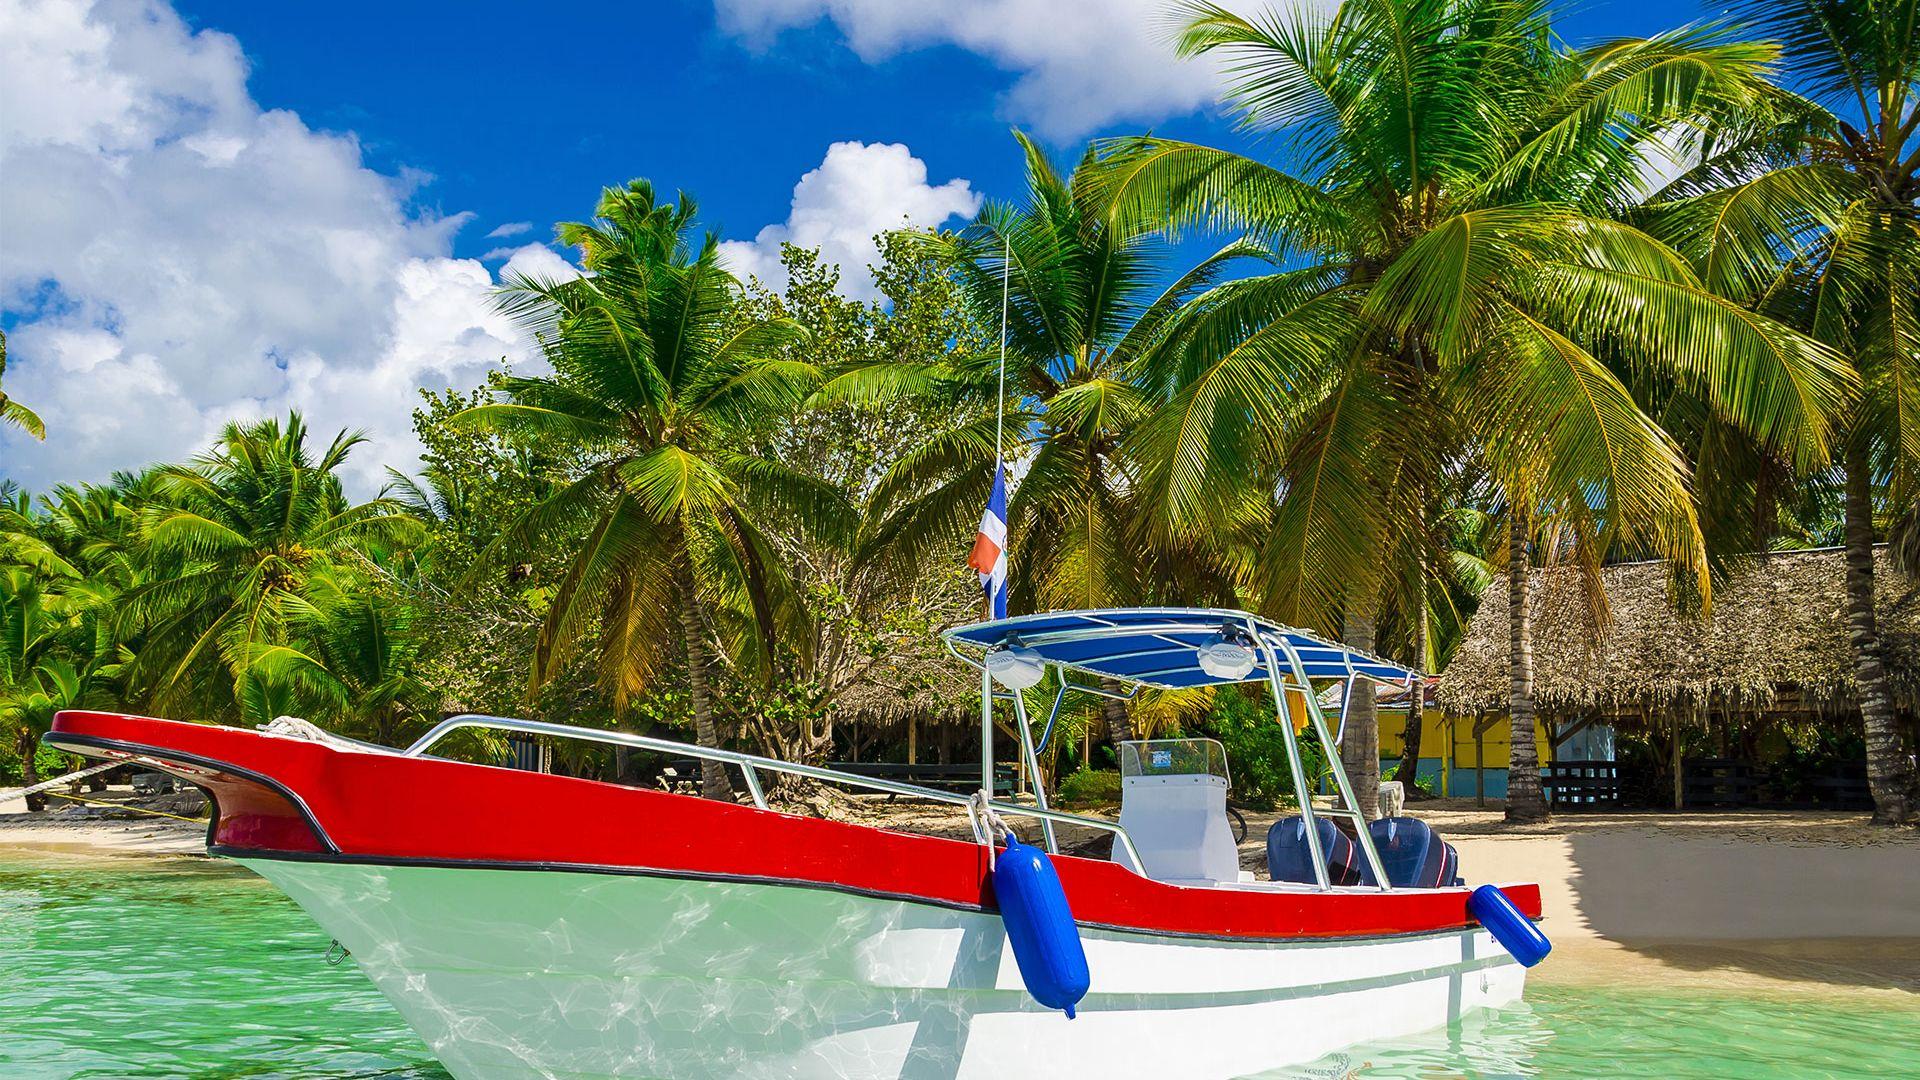 Revelion 2022 - Sejur Plaja La Romana & Punta Cana, Republica Dominicana, 14 zile